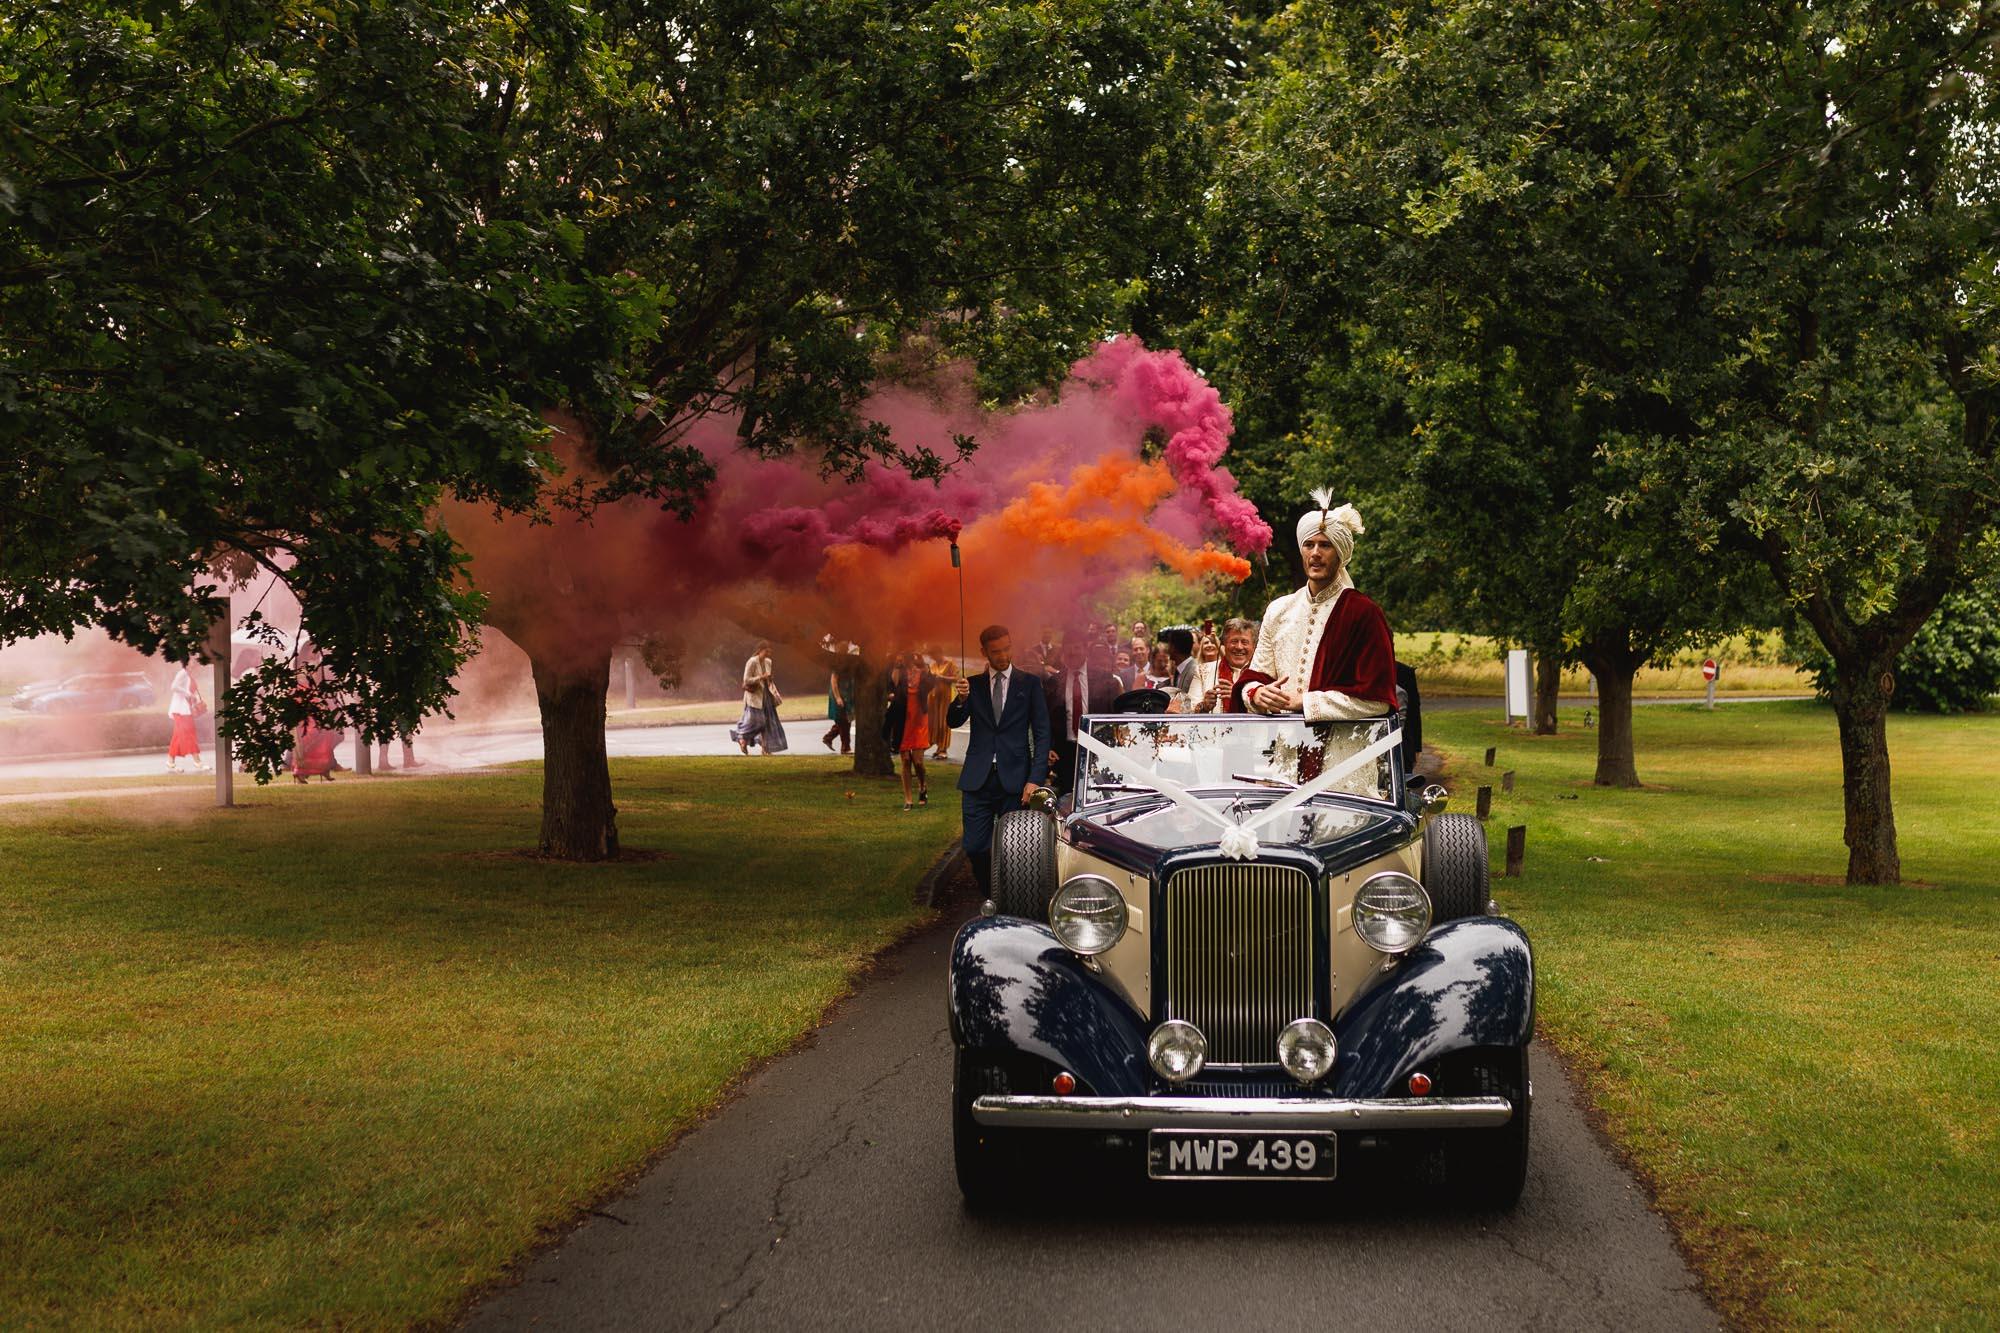 De Vere Wokefield Estate, Asian wedding photographer, grooms entrance, smoke bombs, smoke grenades